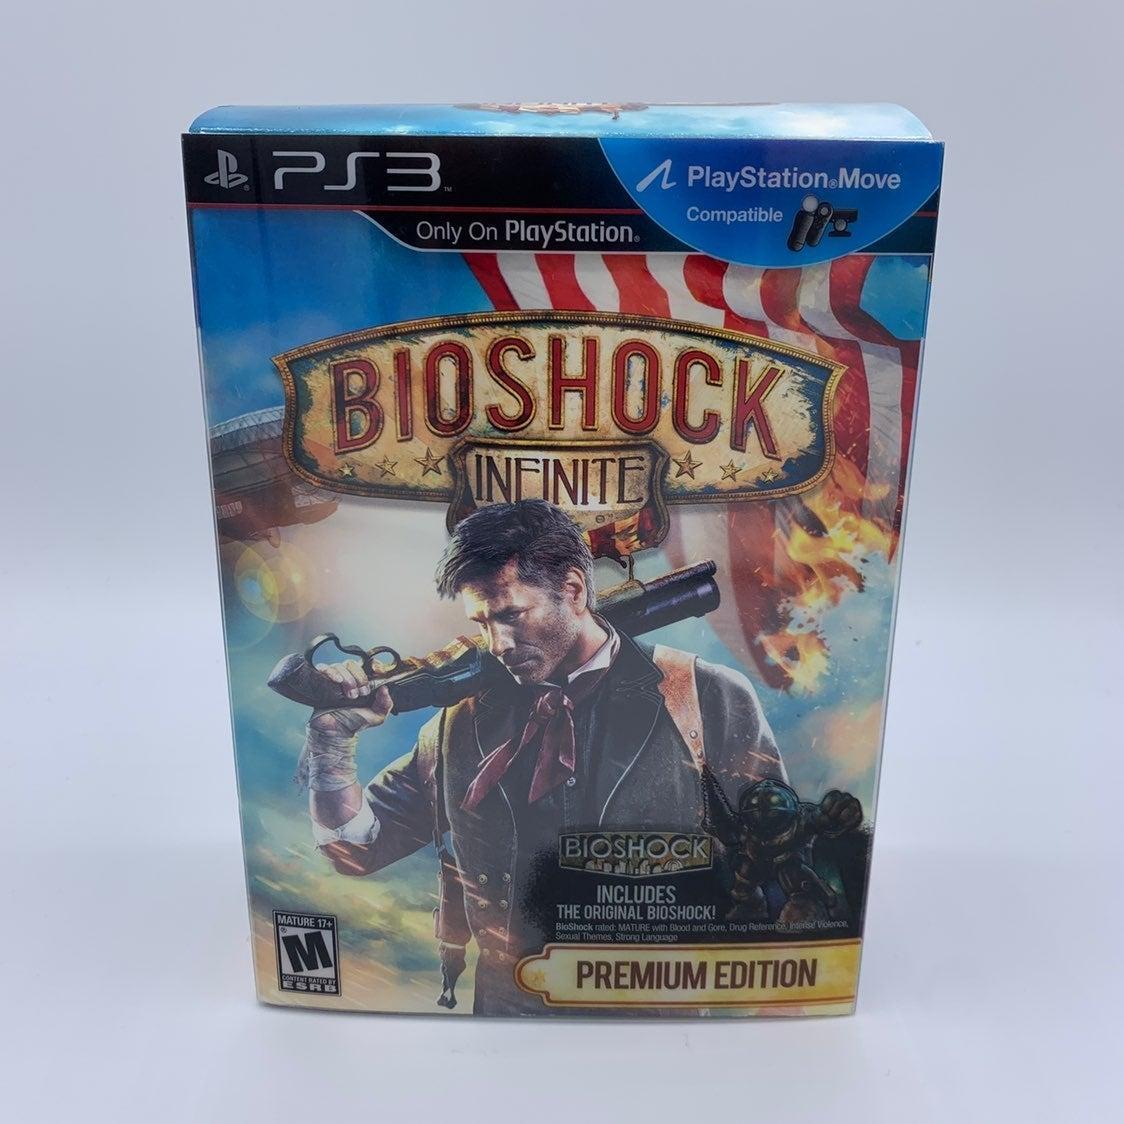 Bioshock Infinite Premium Edition on PS3